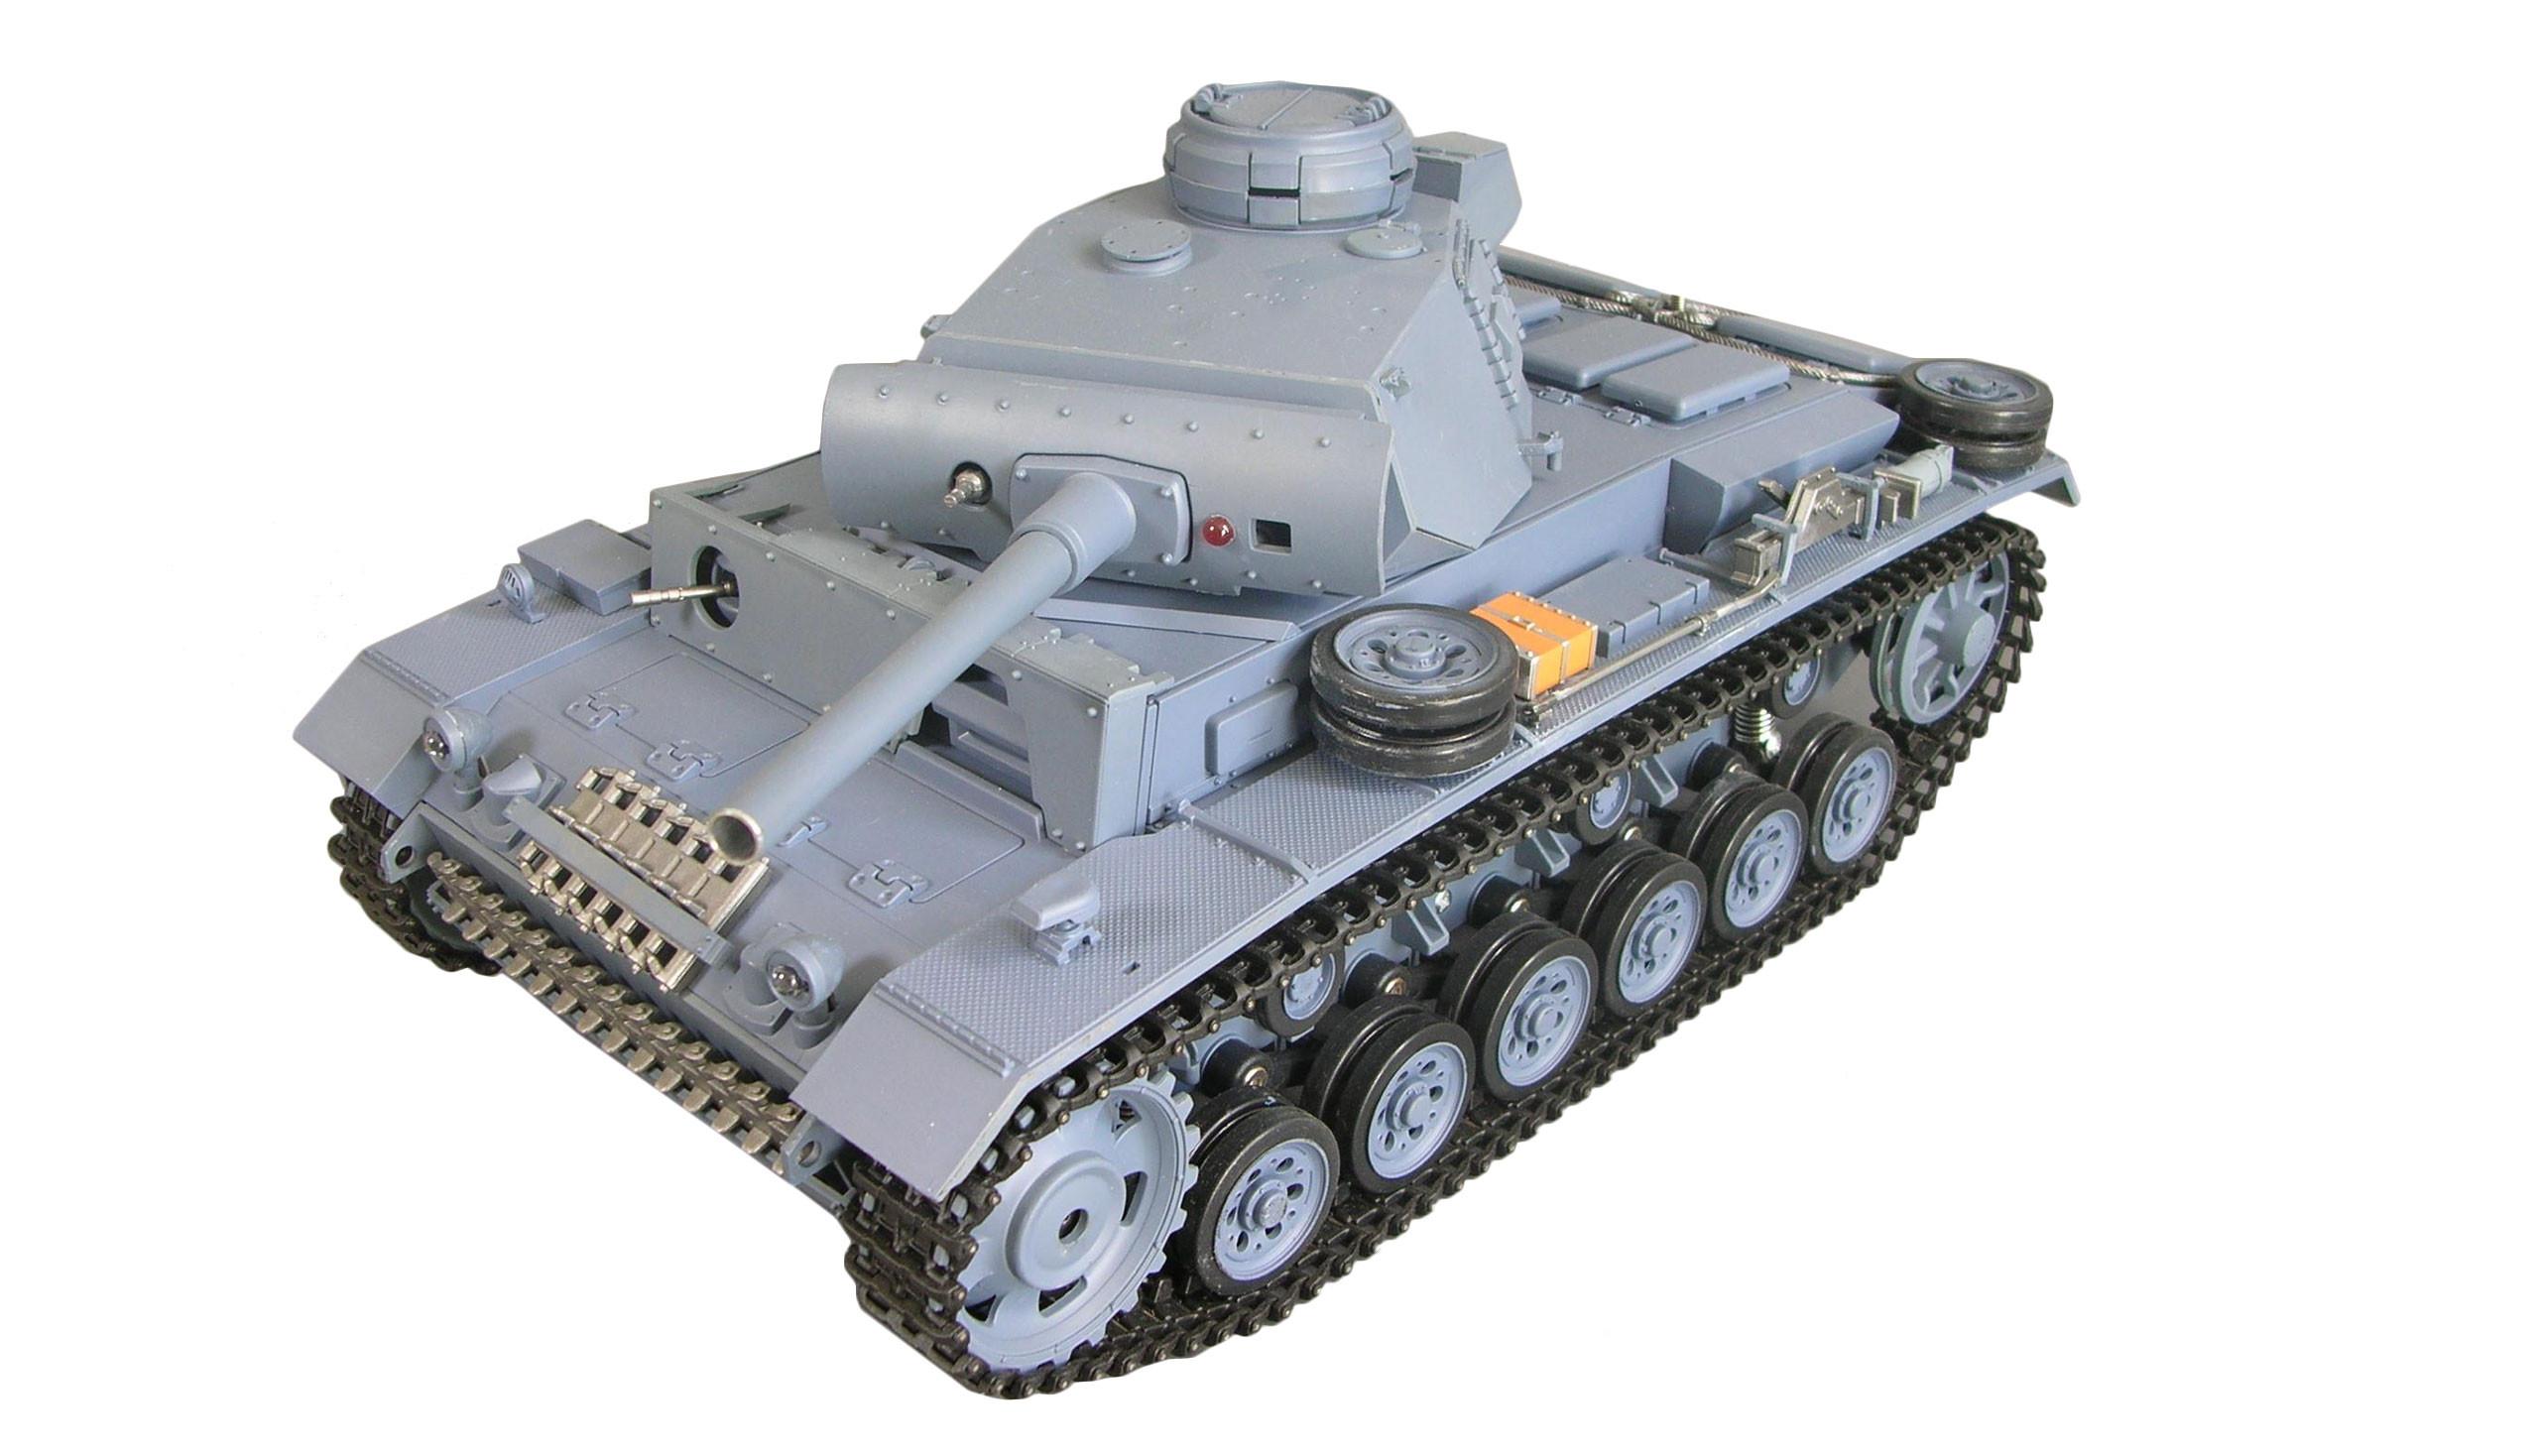 Amewi 23063 - Funkgesteuerter (RC) Panzer - Elektromotor - 1:16 - Betriebsbereit (RTR) - Grau - 2,4 GHz